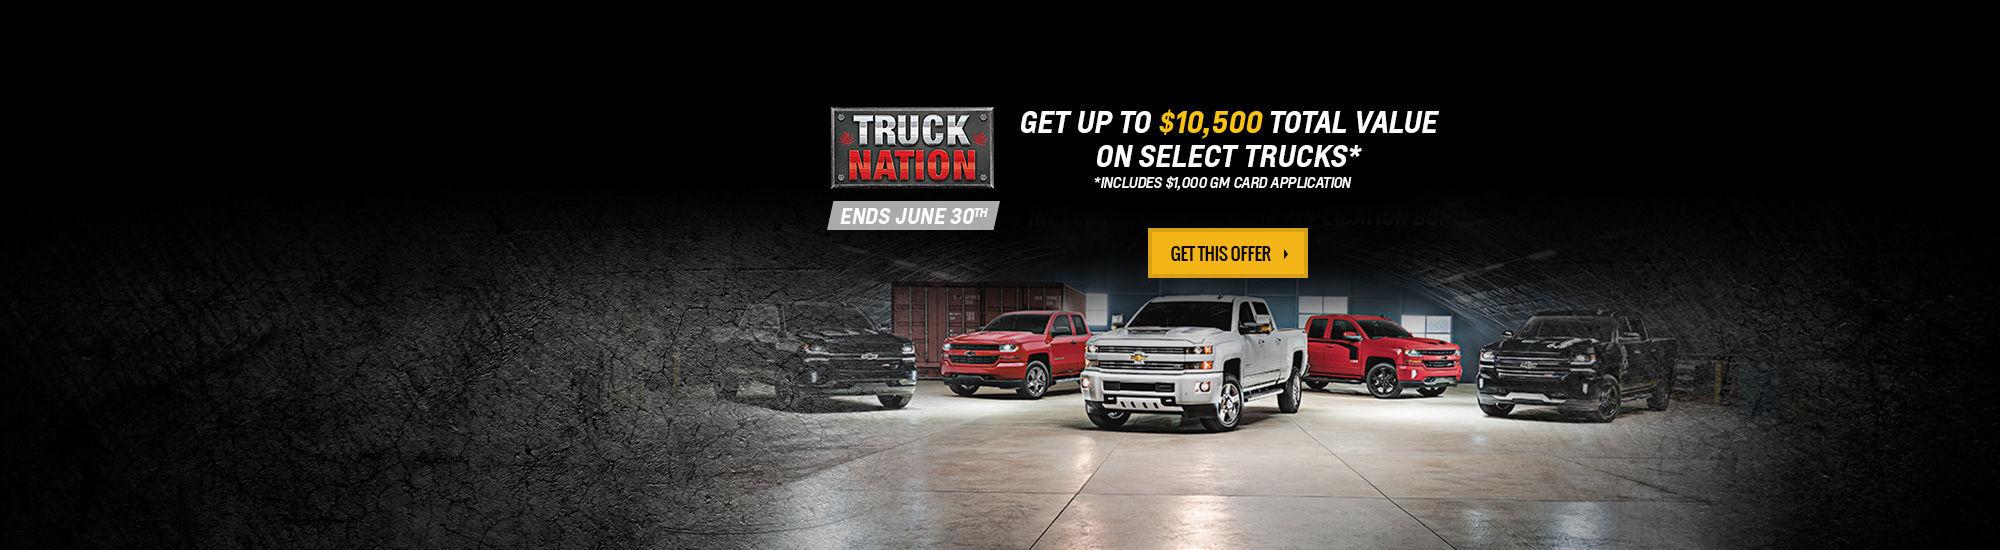 Truck Nation June